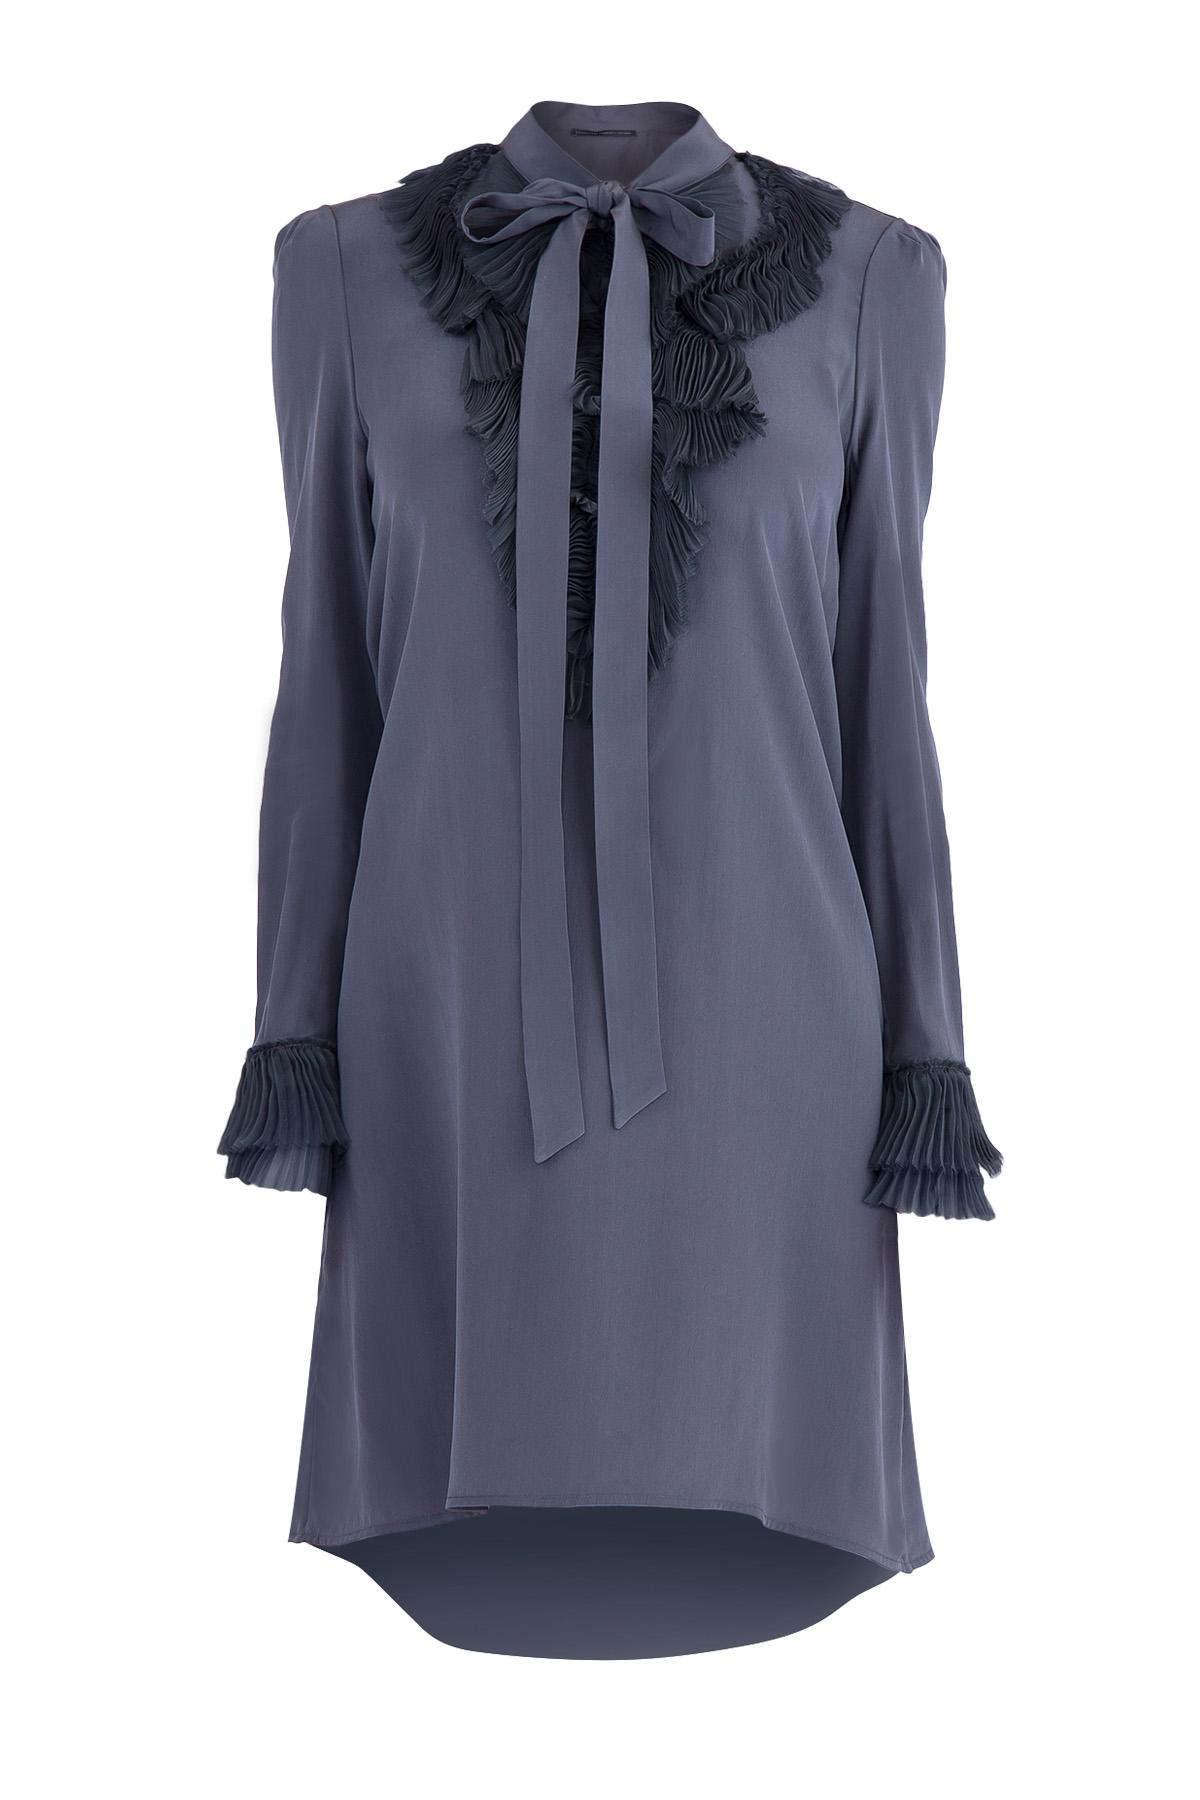 Купить Платье, ERMANNO SCERVINO, Италия, шелк 100%